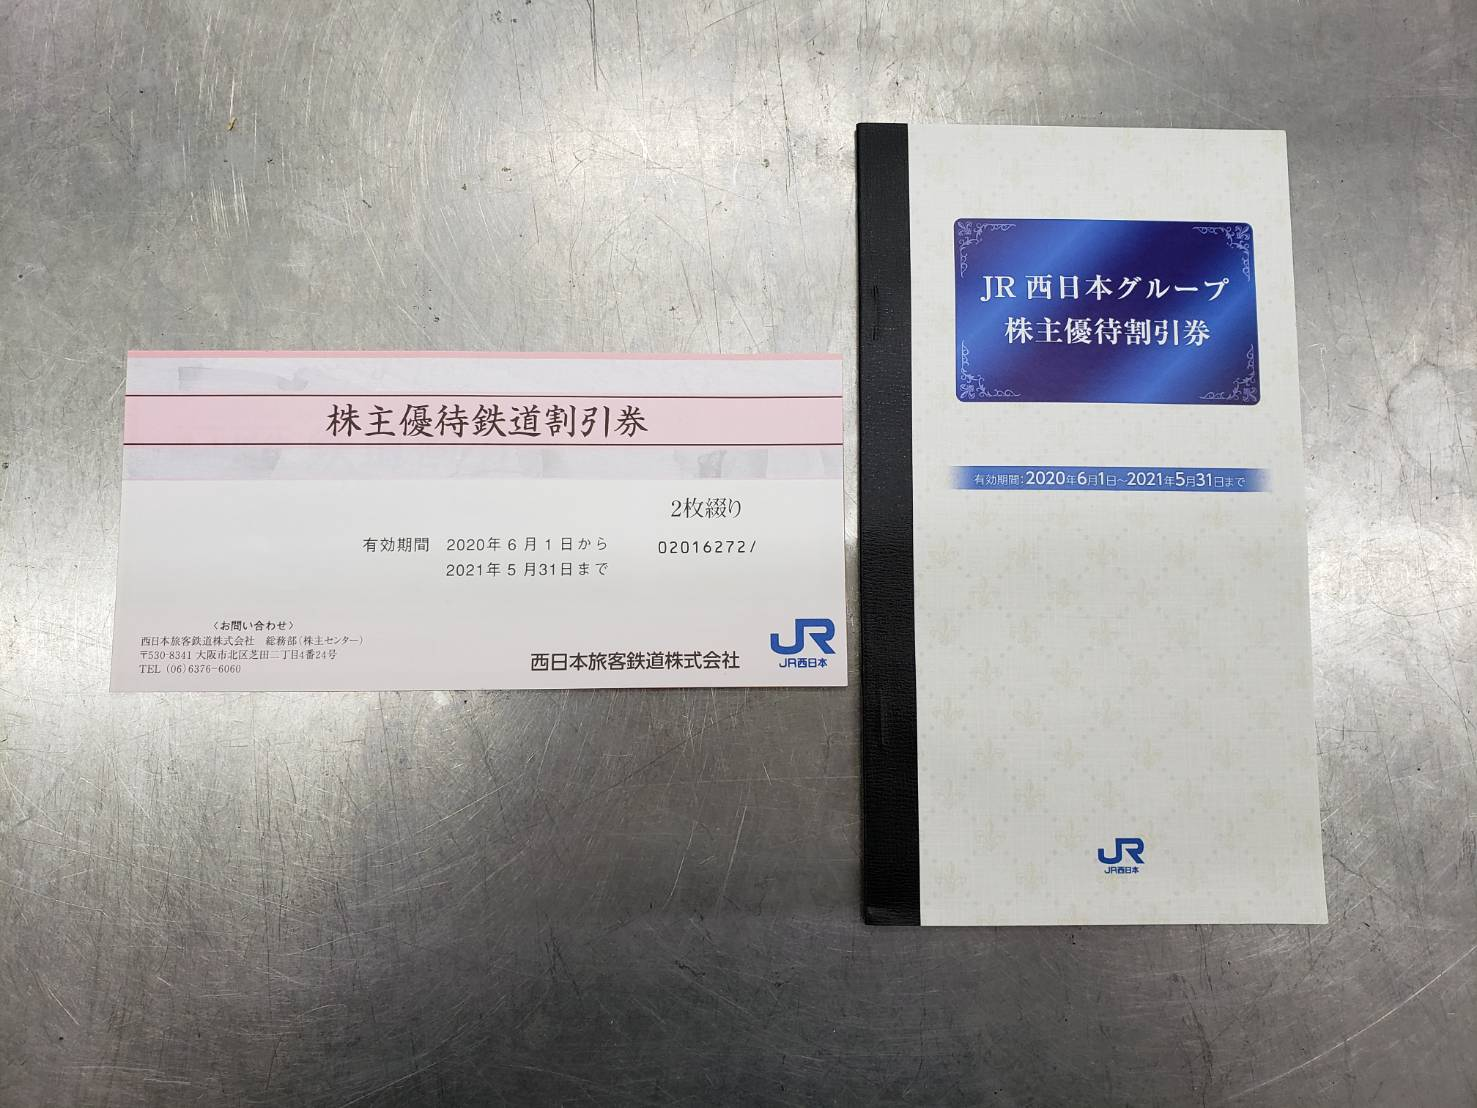 JR 株主優待鉄道割引券、JR西日本グループ 株主優待割引券 買取致しました。の買取-